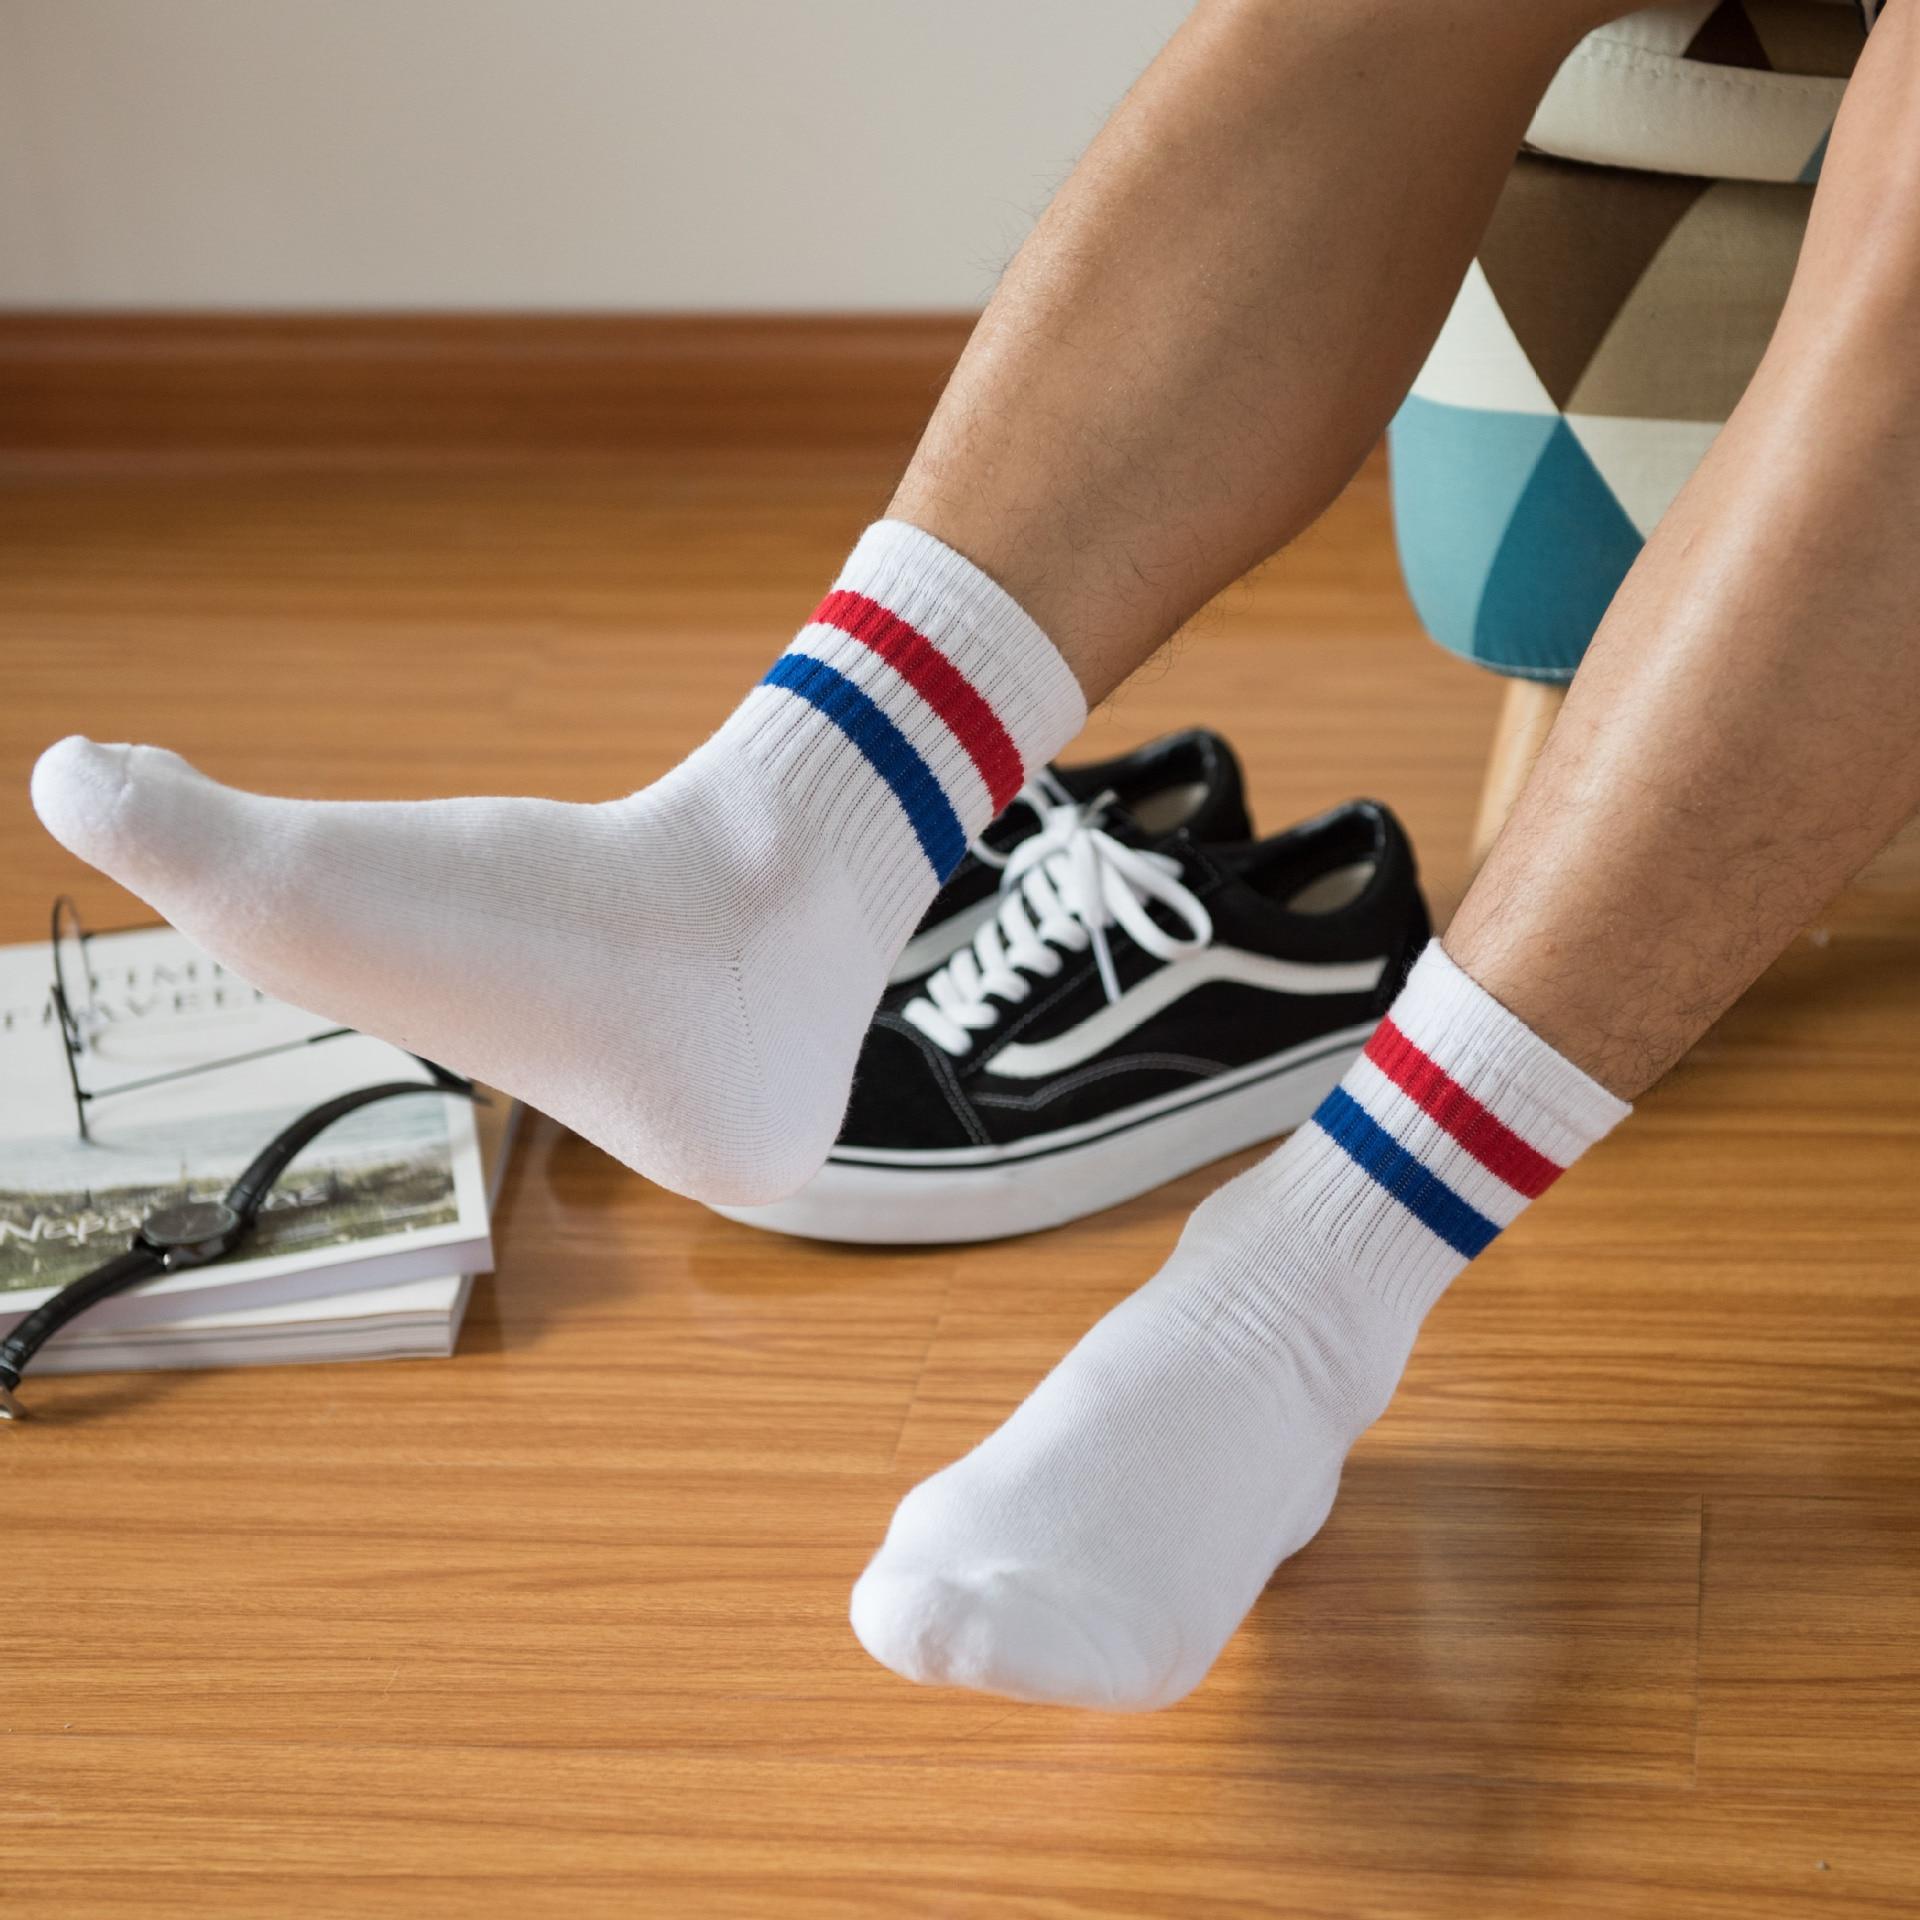 Socks Fashion Socks Vintage Short Sports Socks Solid Cotton Socks Casual Streetwear Short Socks For Man Girl Cool Tube Socks